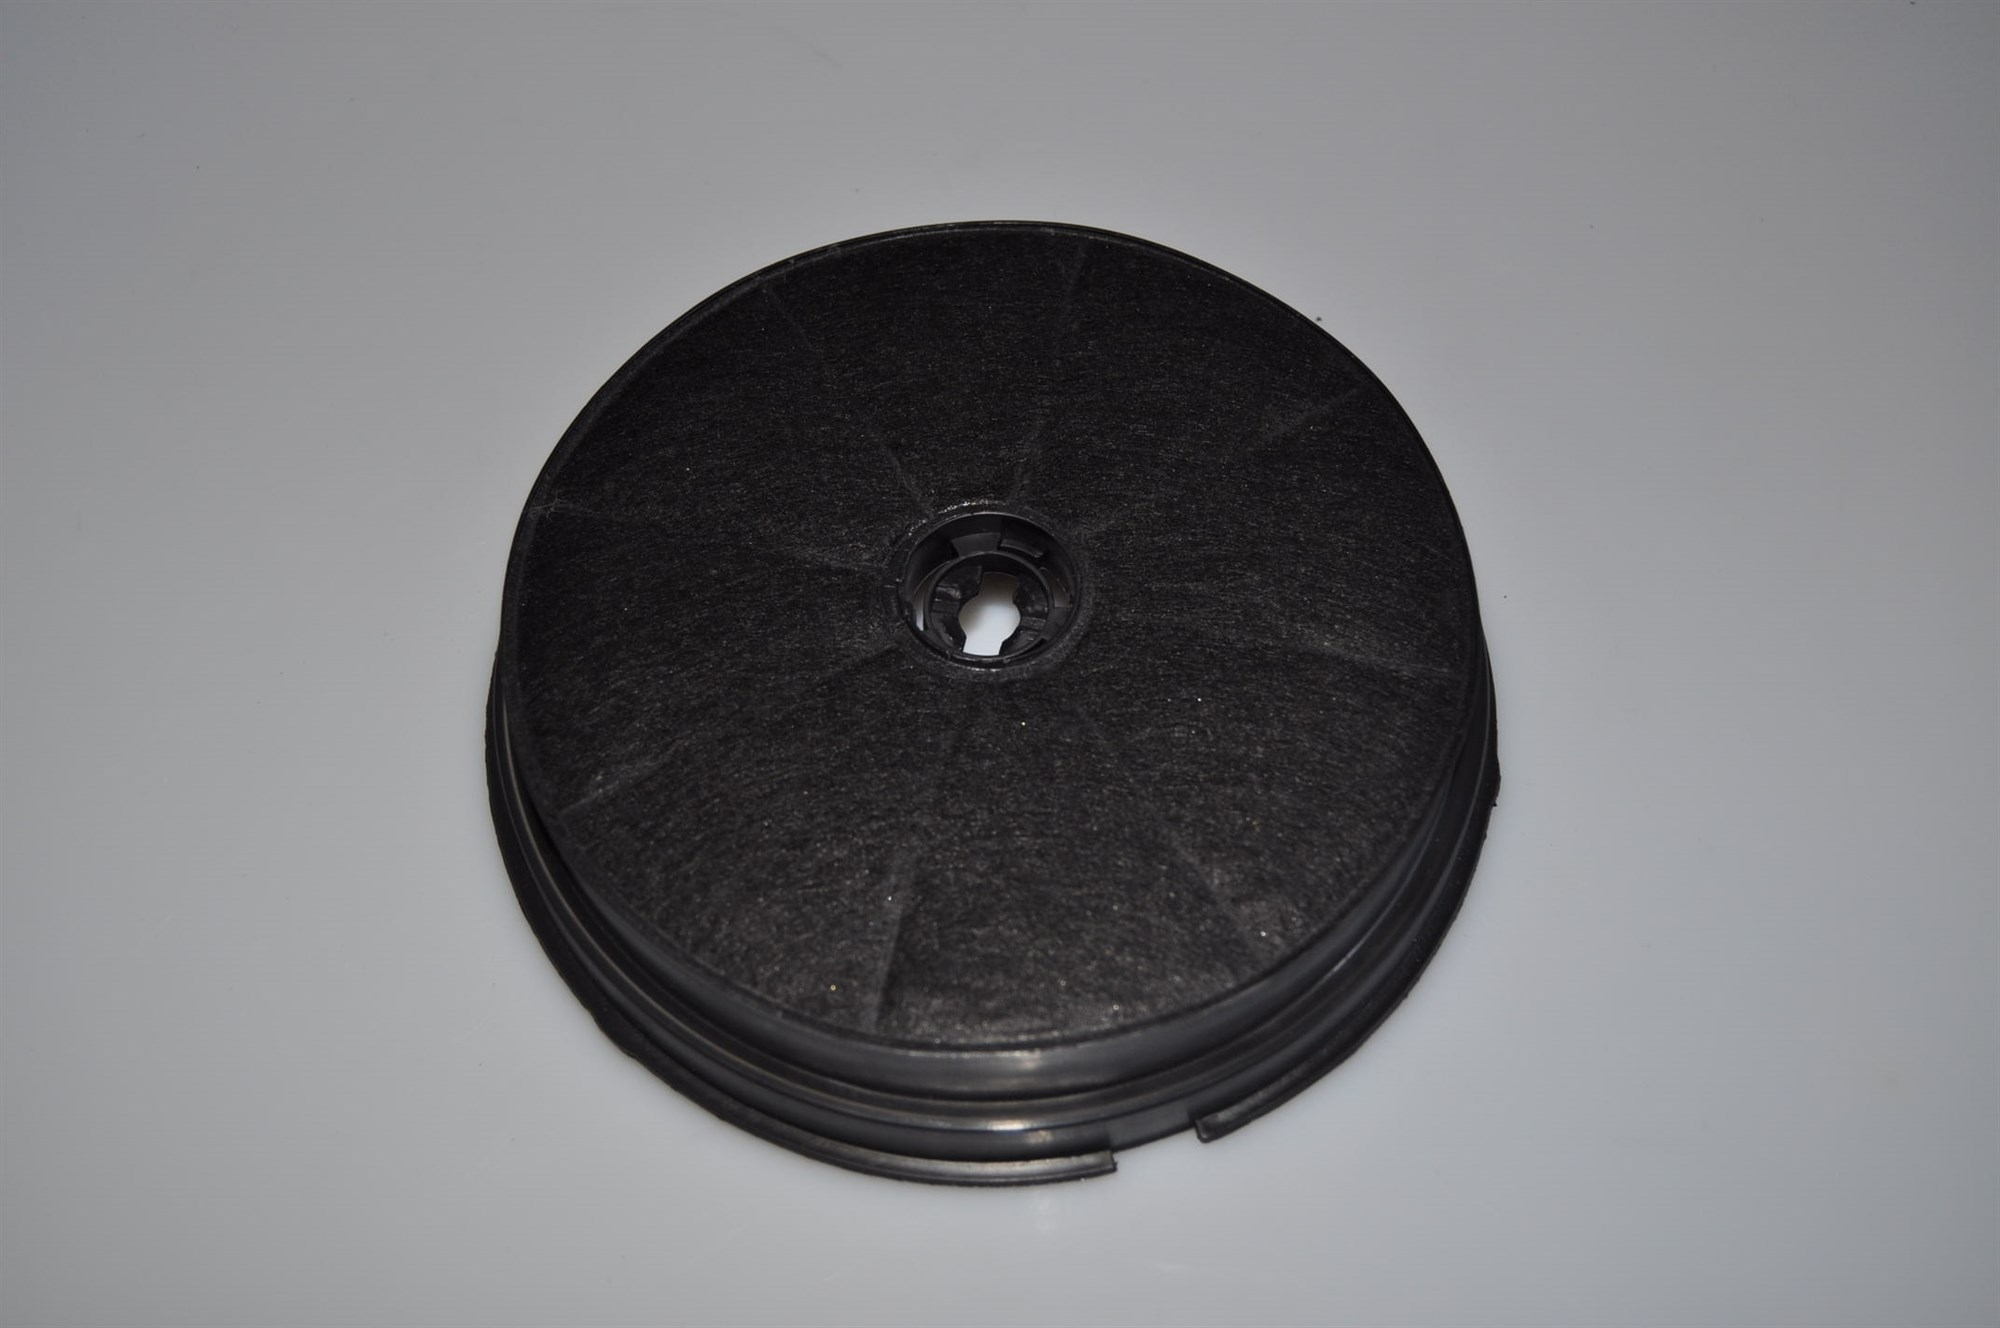 Kohlefilter admiral dunstabzugshaube 37 mm